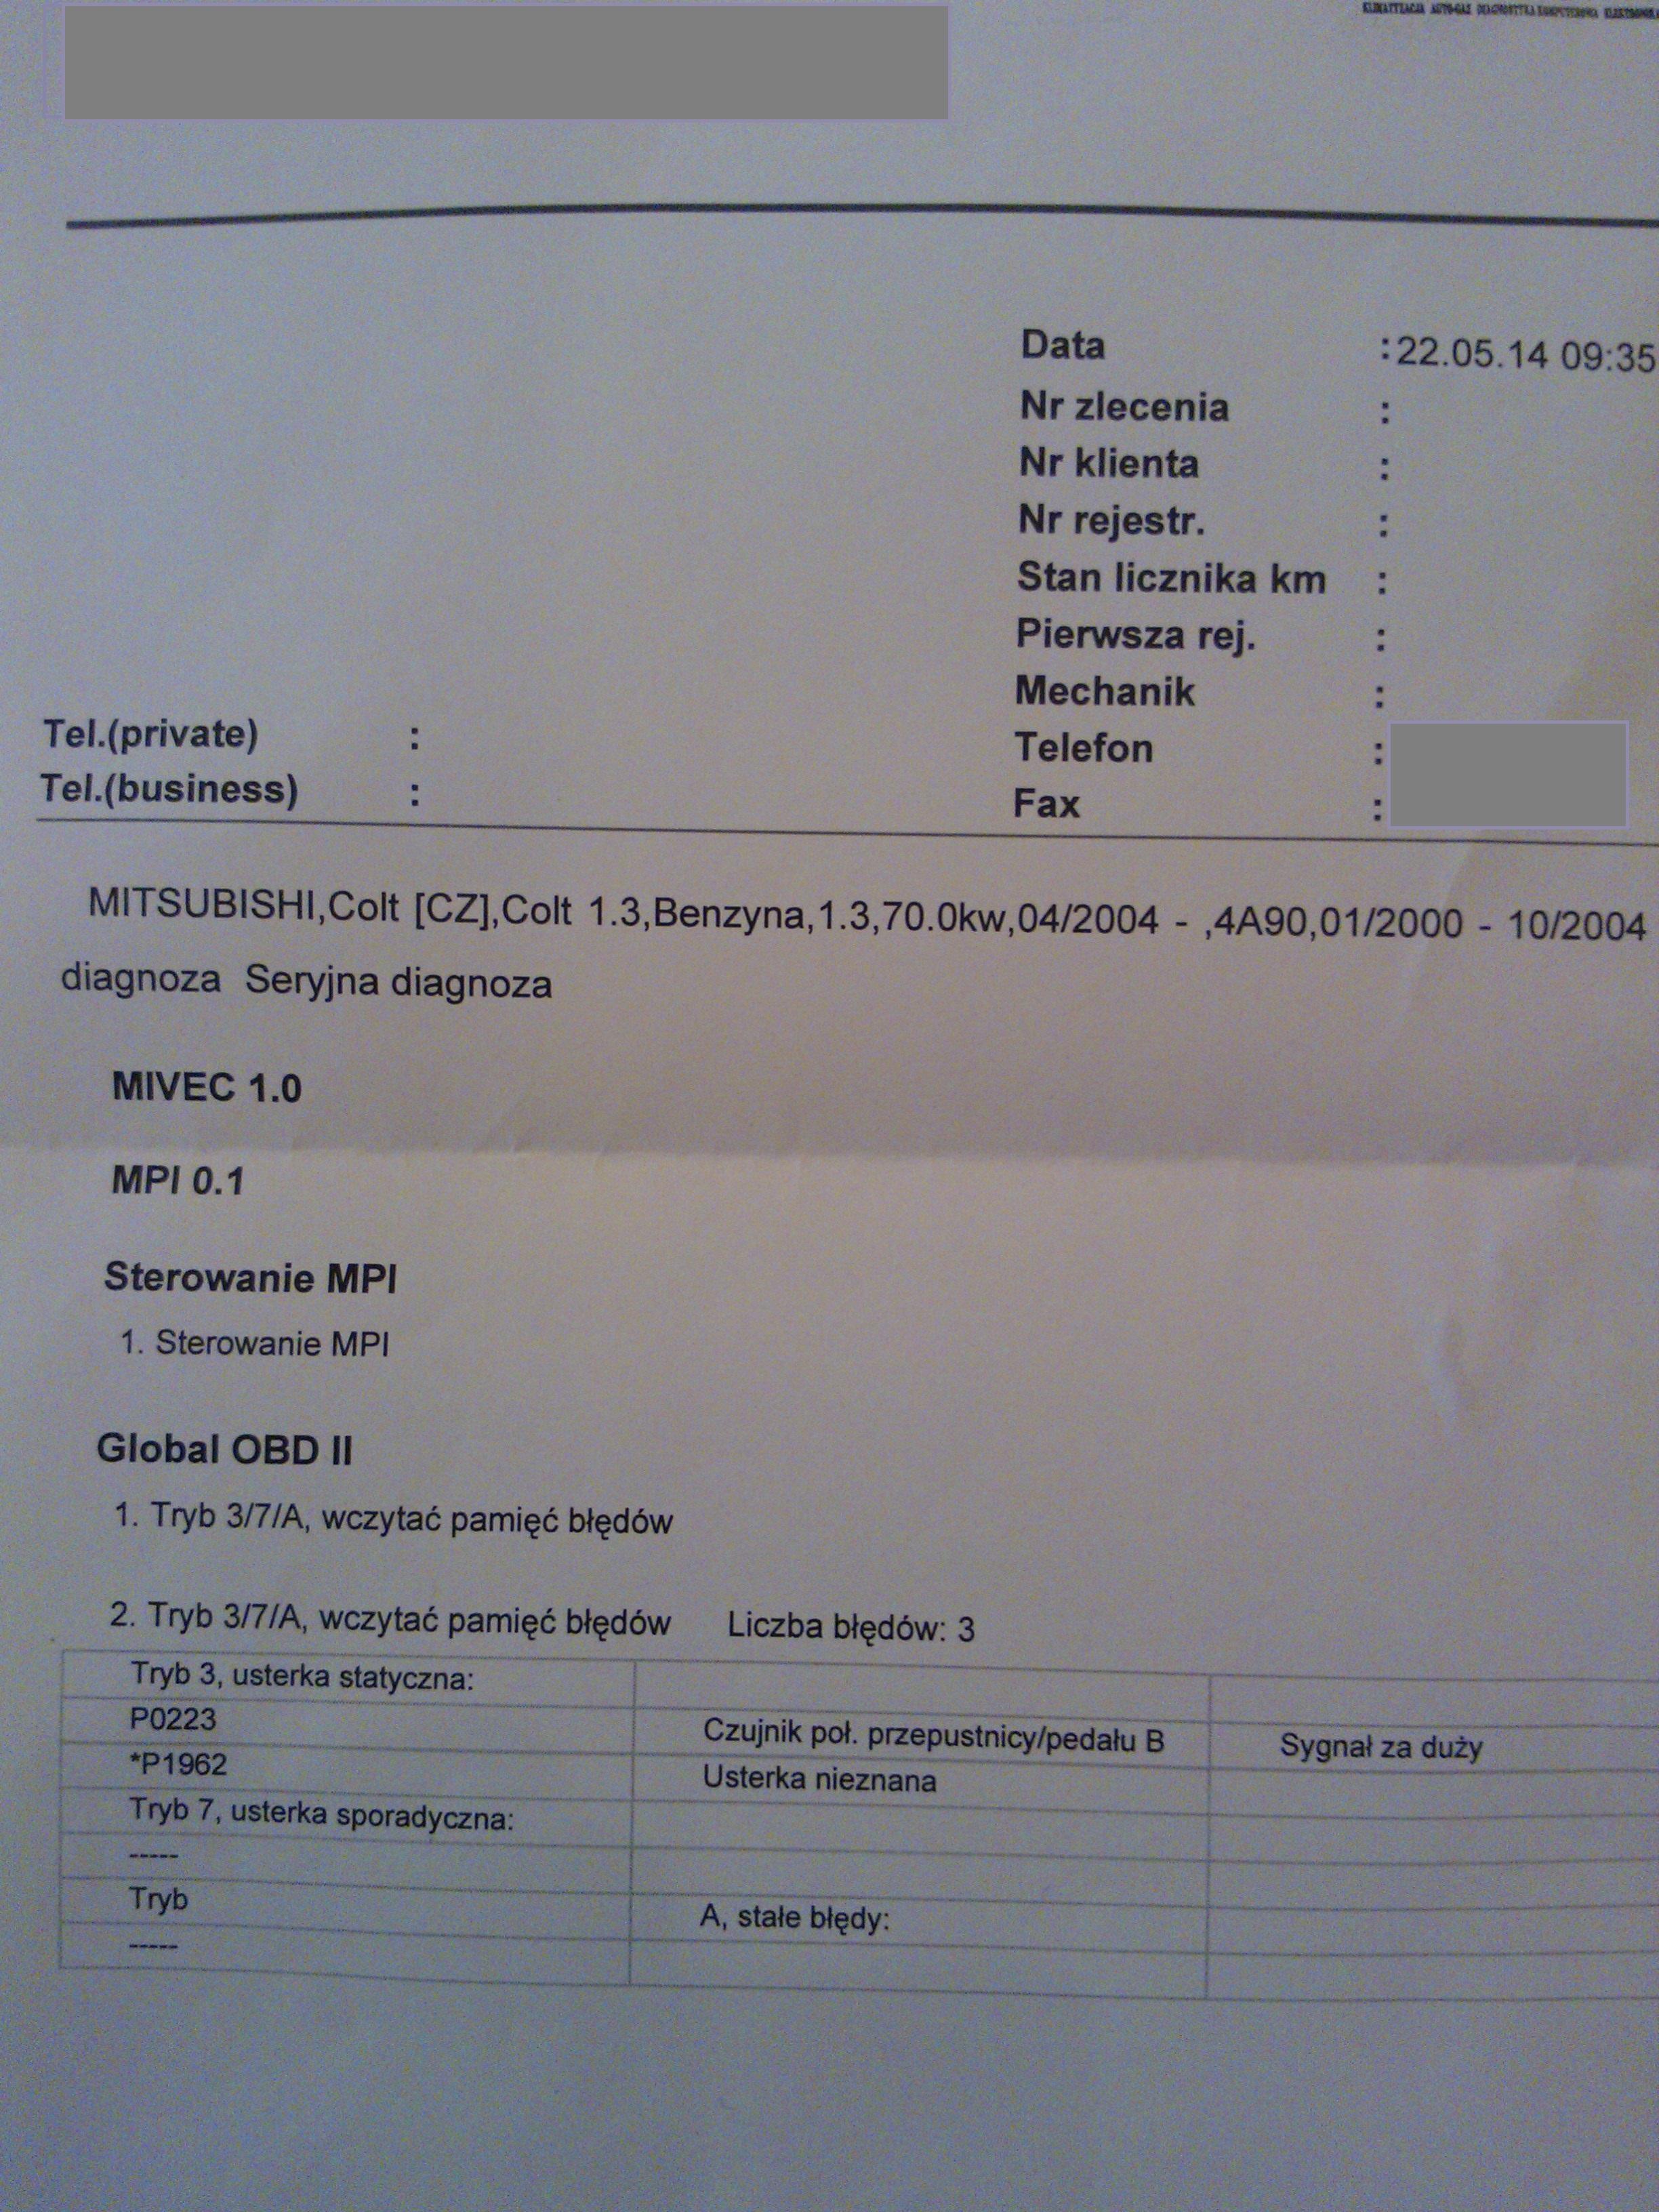 Mitsubishi Colt 1,3 2004 - Opisy b��d�w z diagnostyki